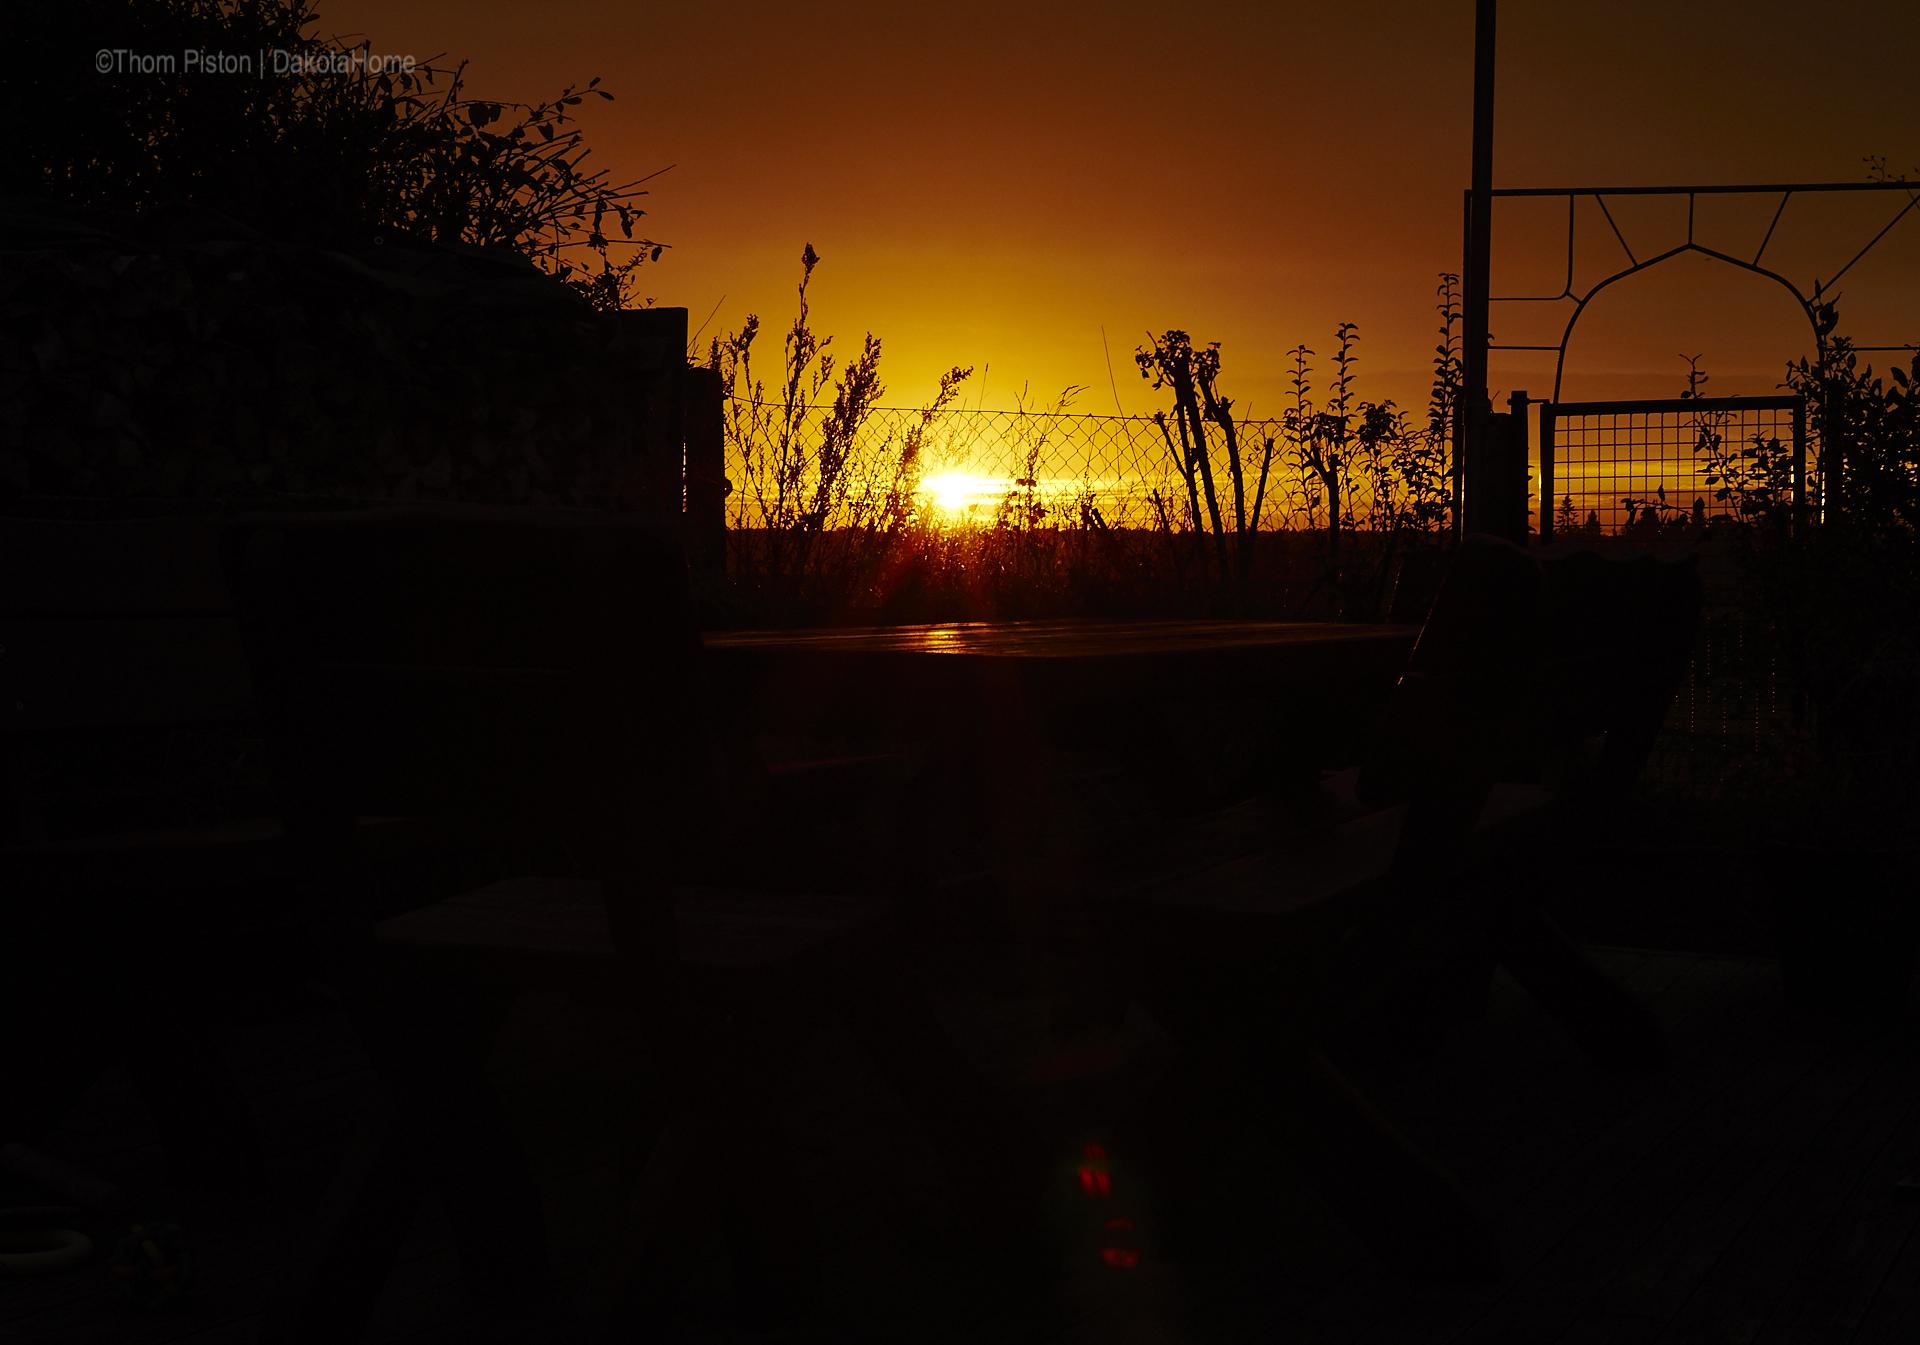 Sonnenuntergänge , november 2018, dakota home